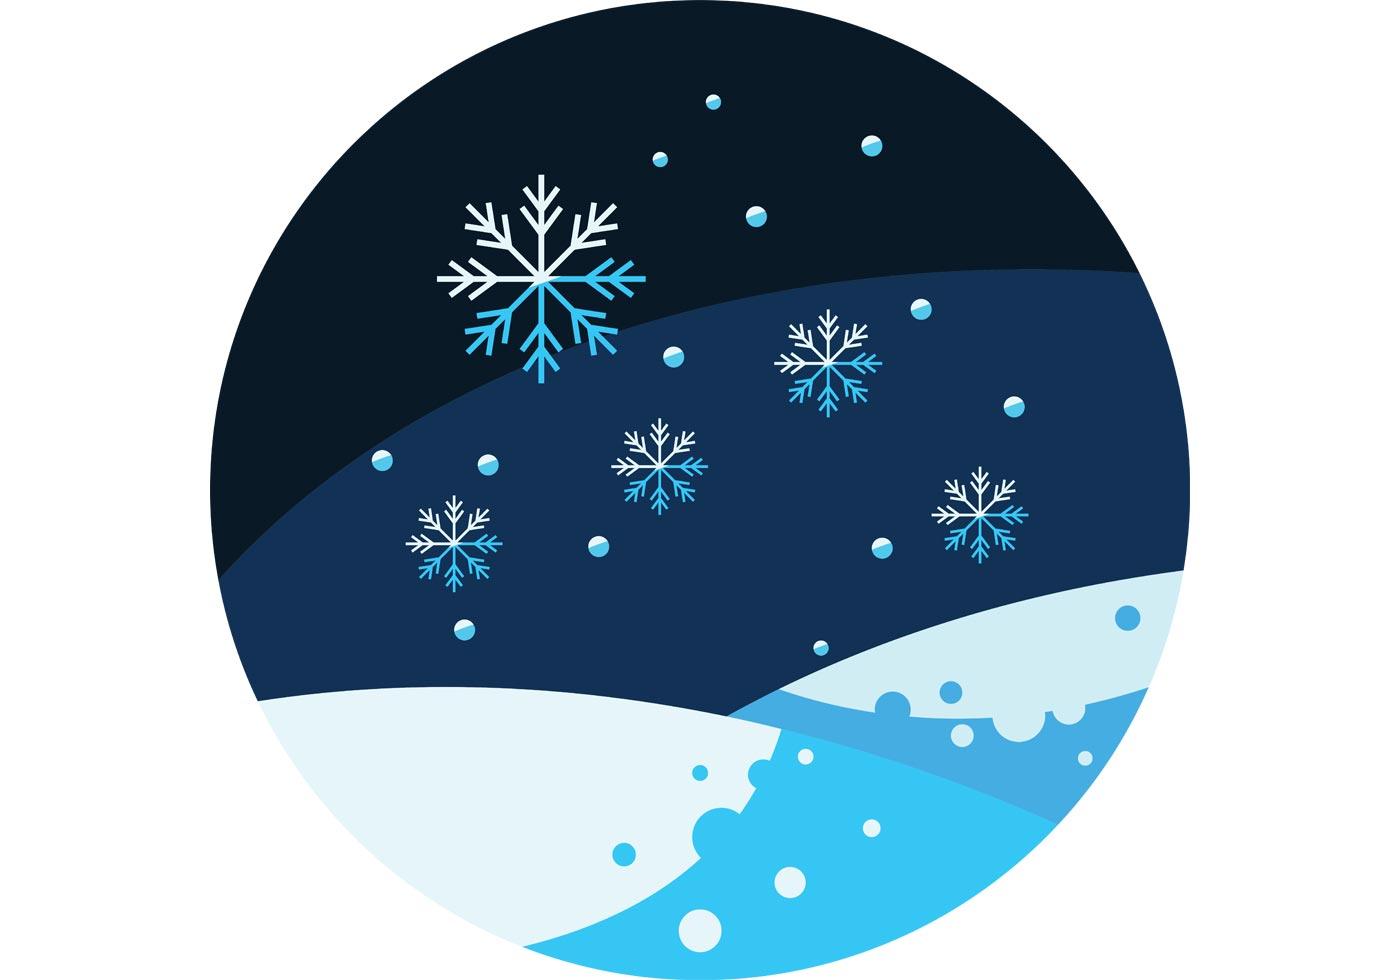 winter vector scene download free vector art stock. Black Bedroom Furniture Sets. Home Design Ideas